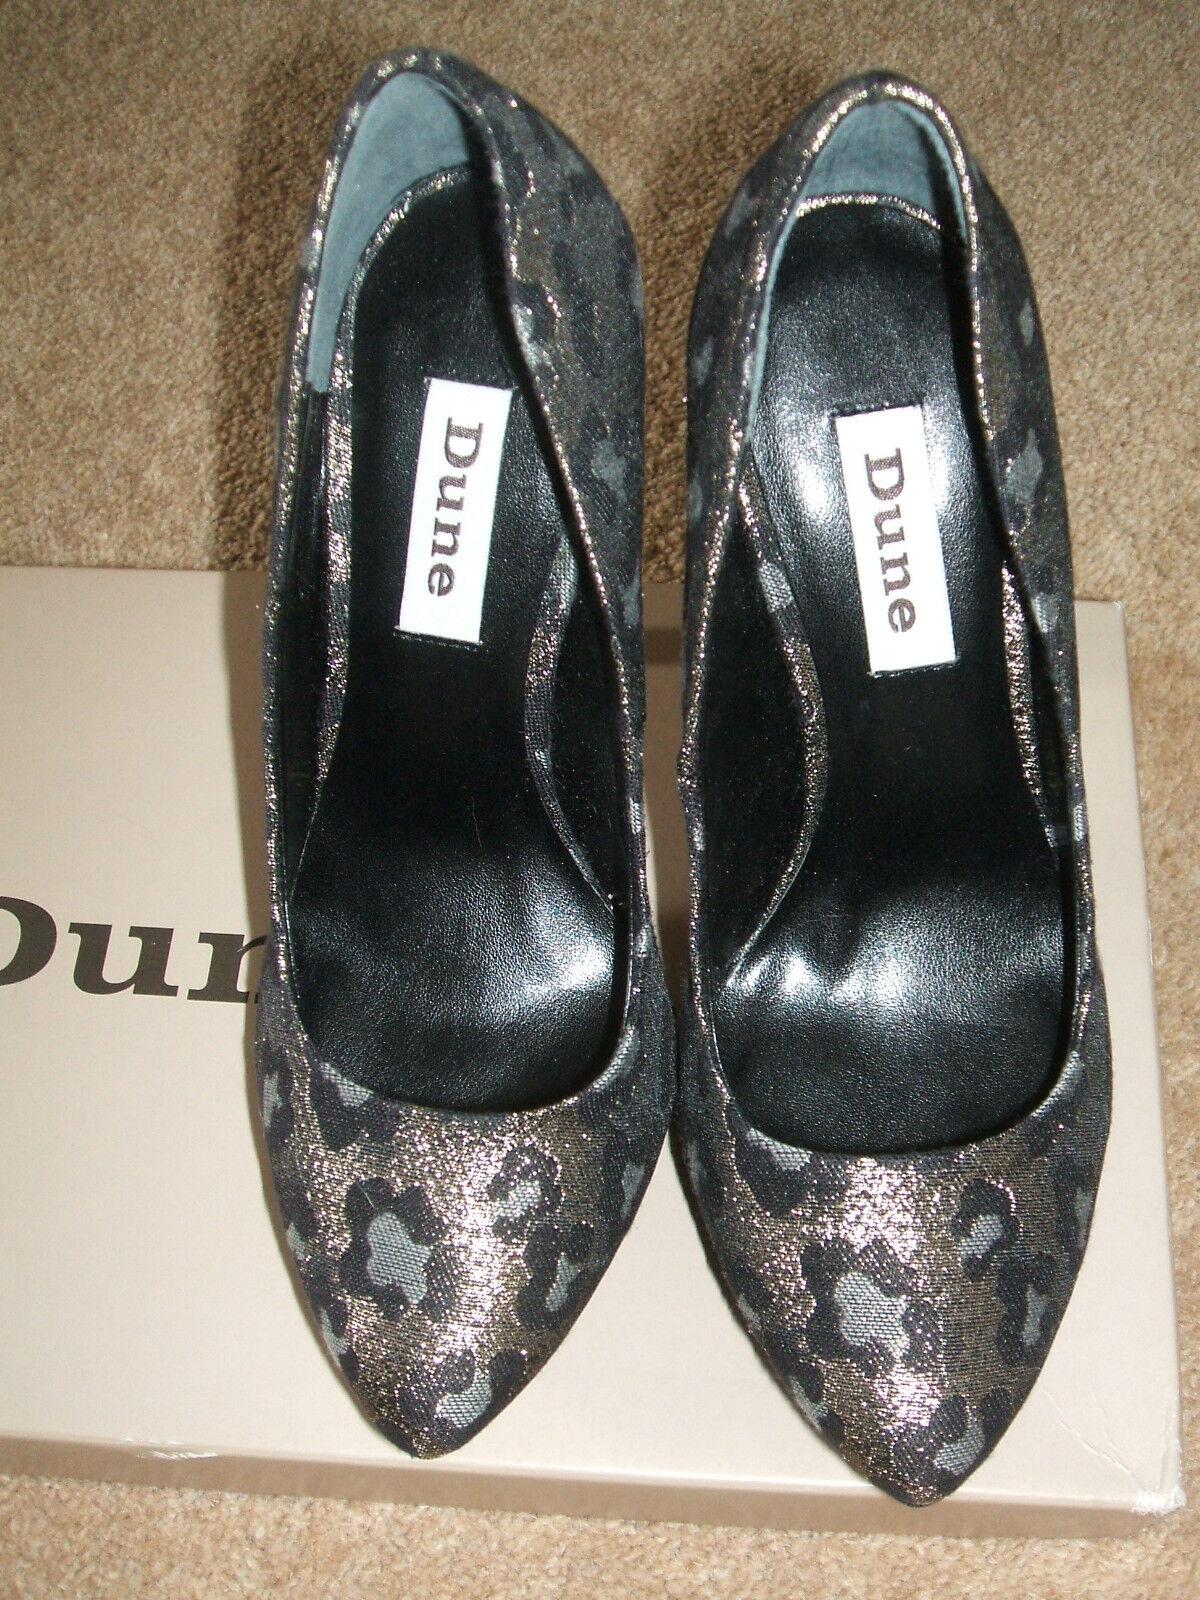 BNWB DUNE SIZE 3 PRINT 36 HUSH D LEOPARD PRINT 3 BLACK GOLD GREY HIGH HEEL COURT Schuhe bb6076